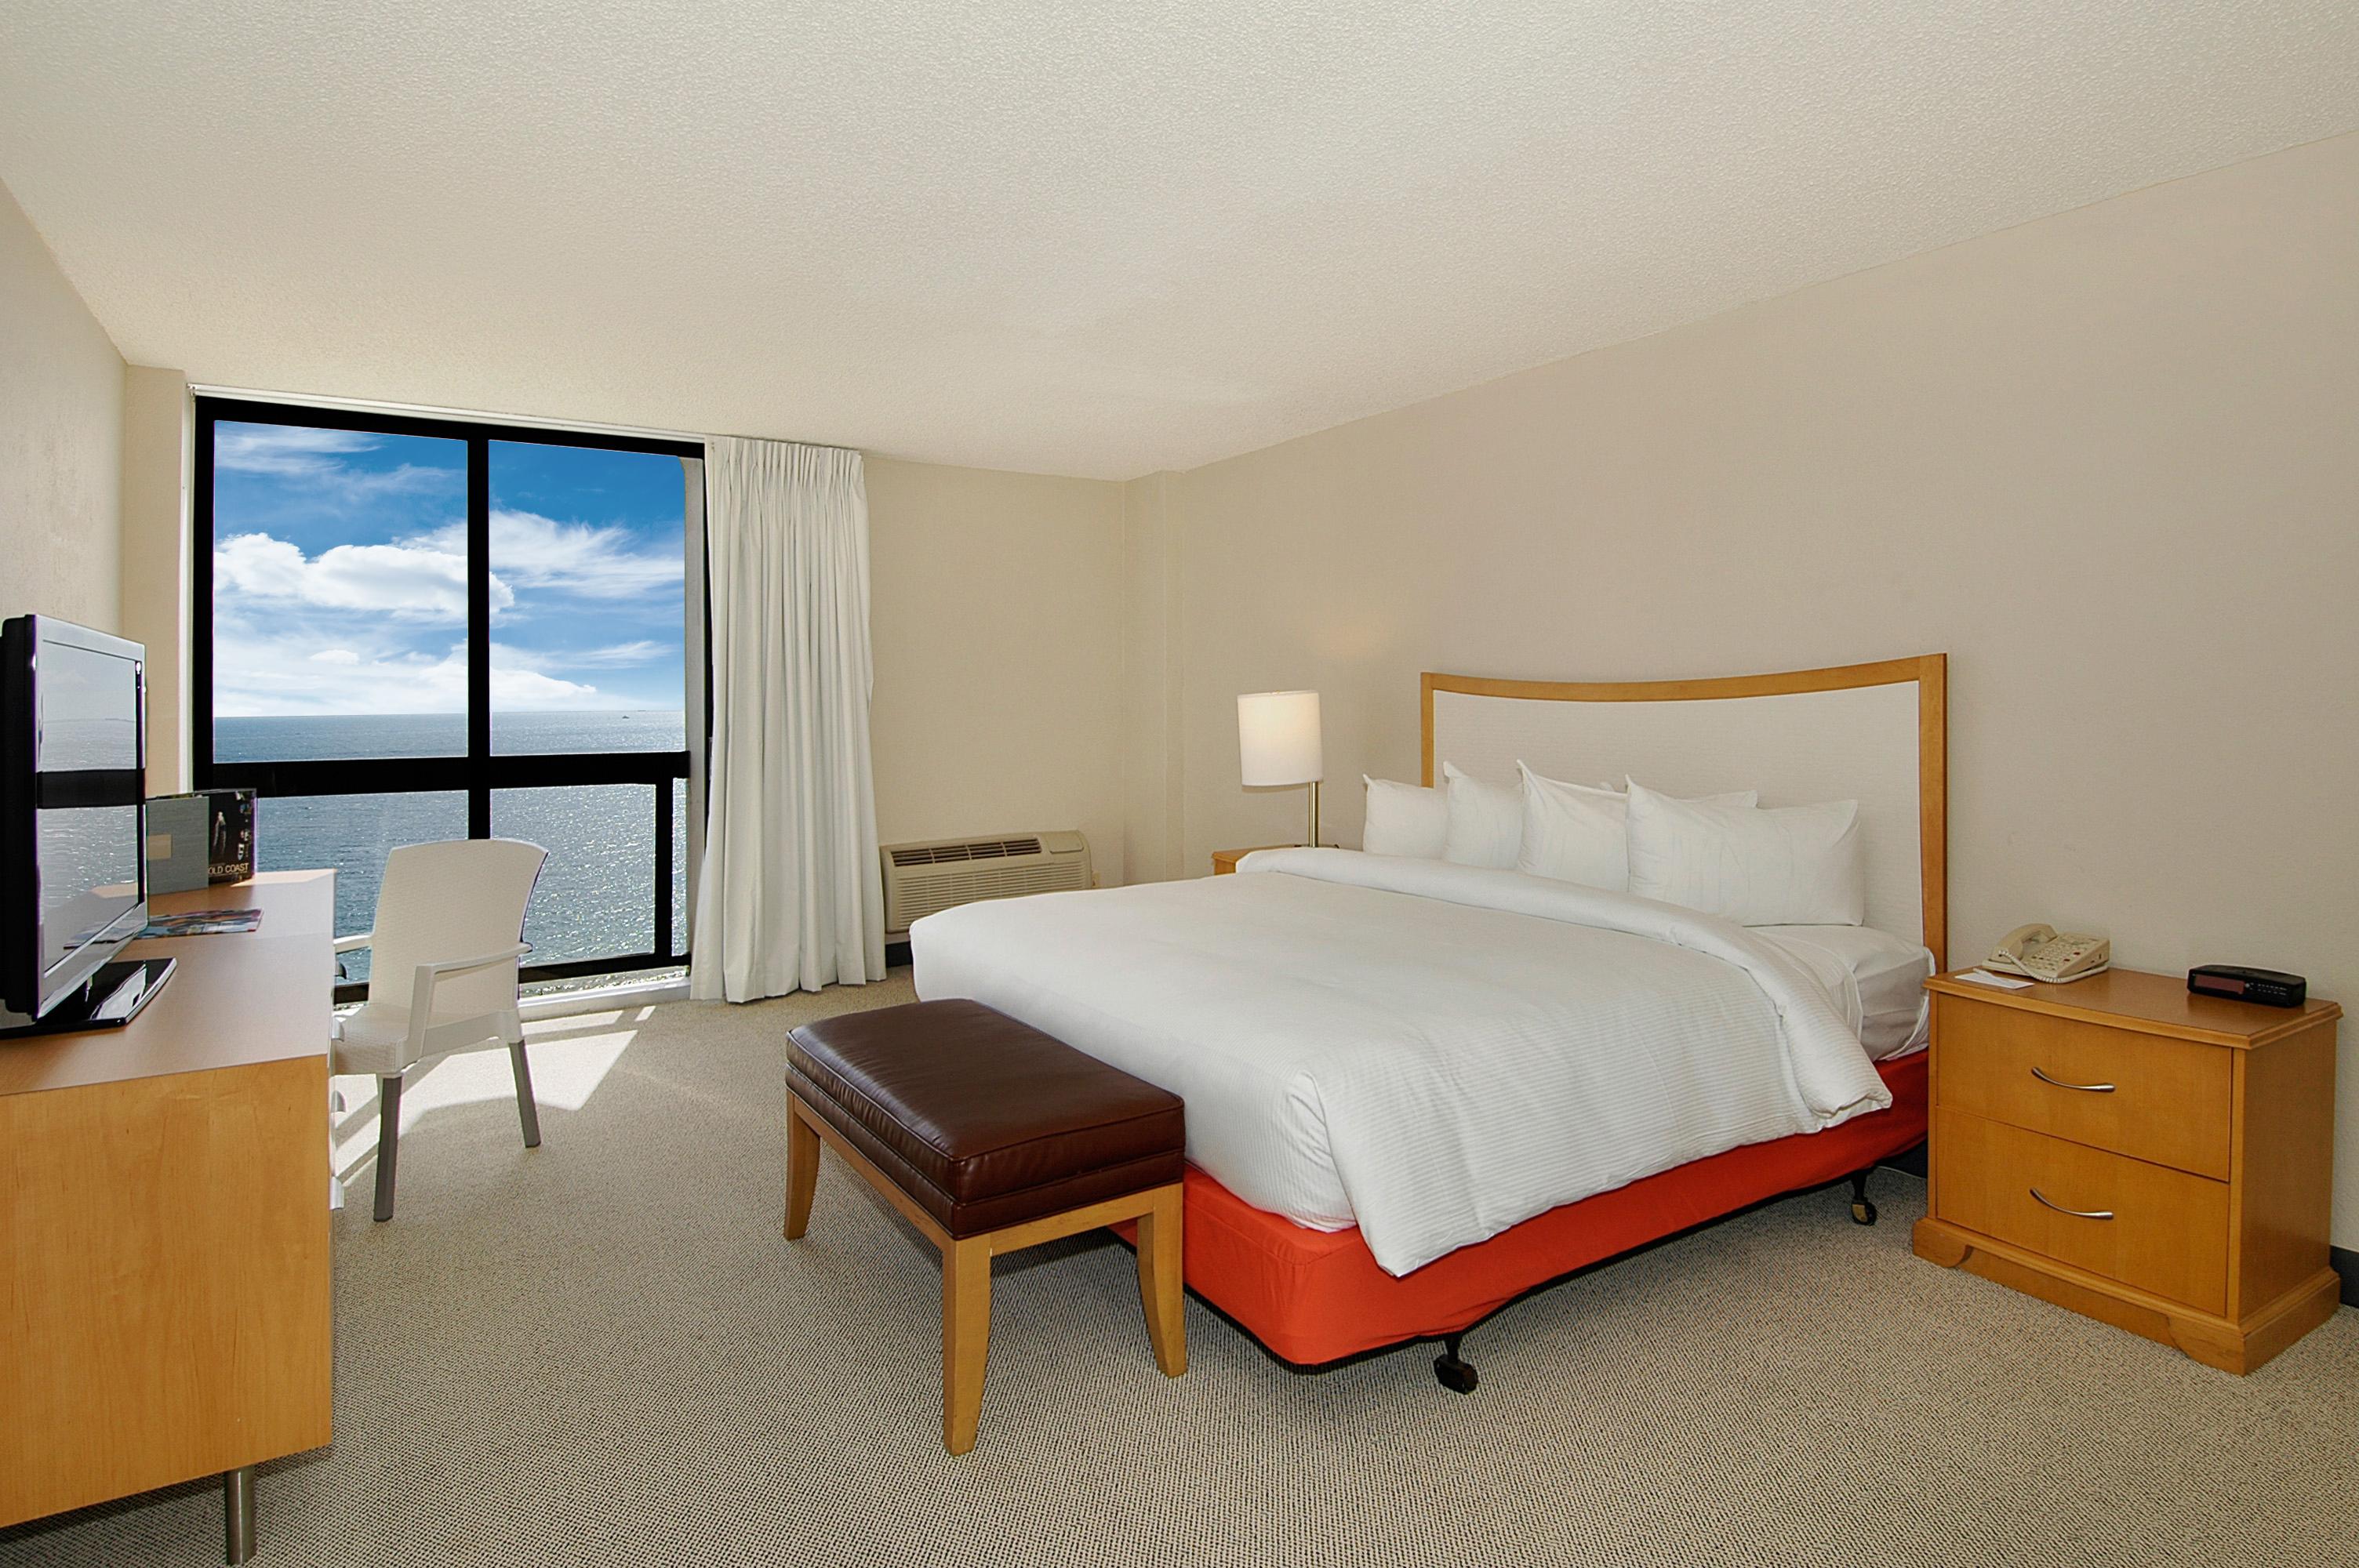 Bahia Mar Fort Lauderdale Beach A DoubleTree By Hilton Hotel Fort Lauderd